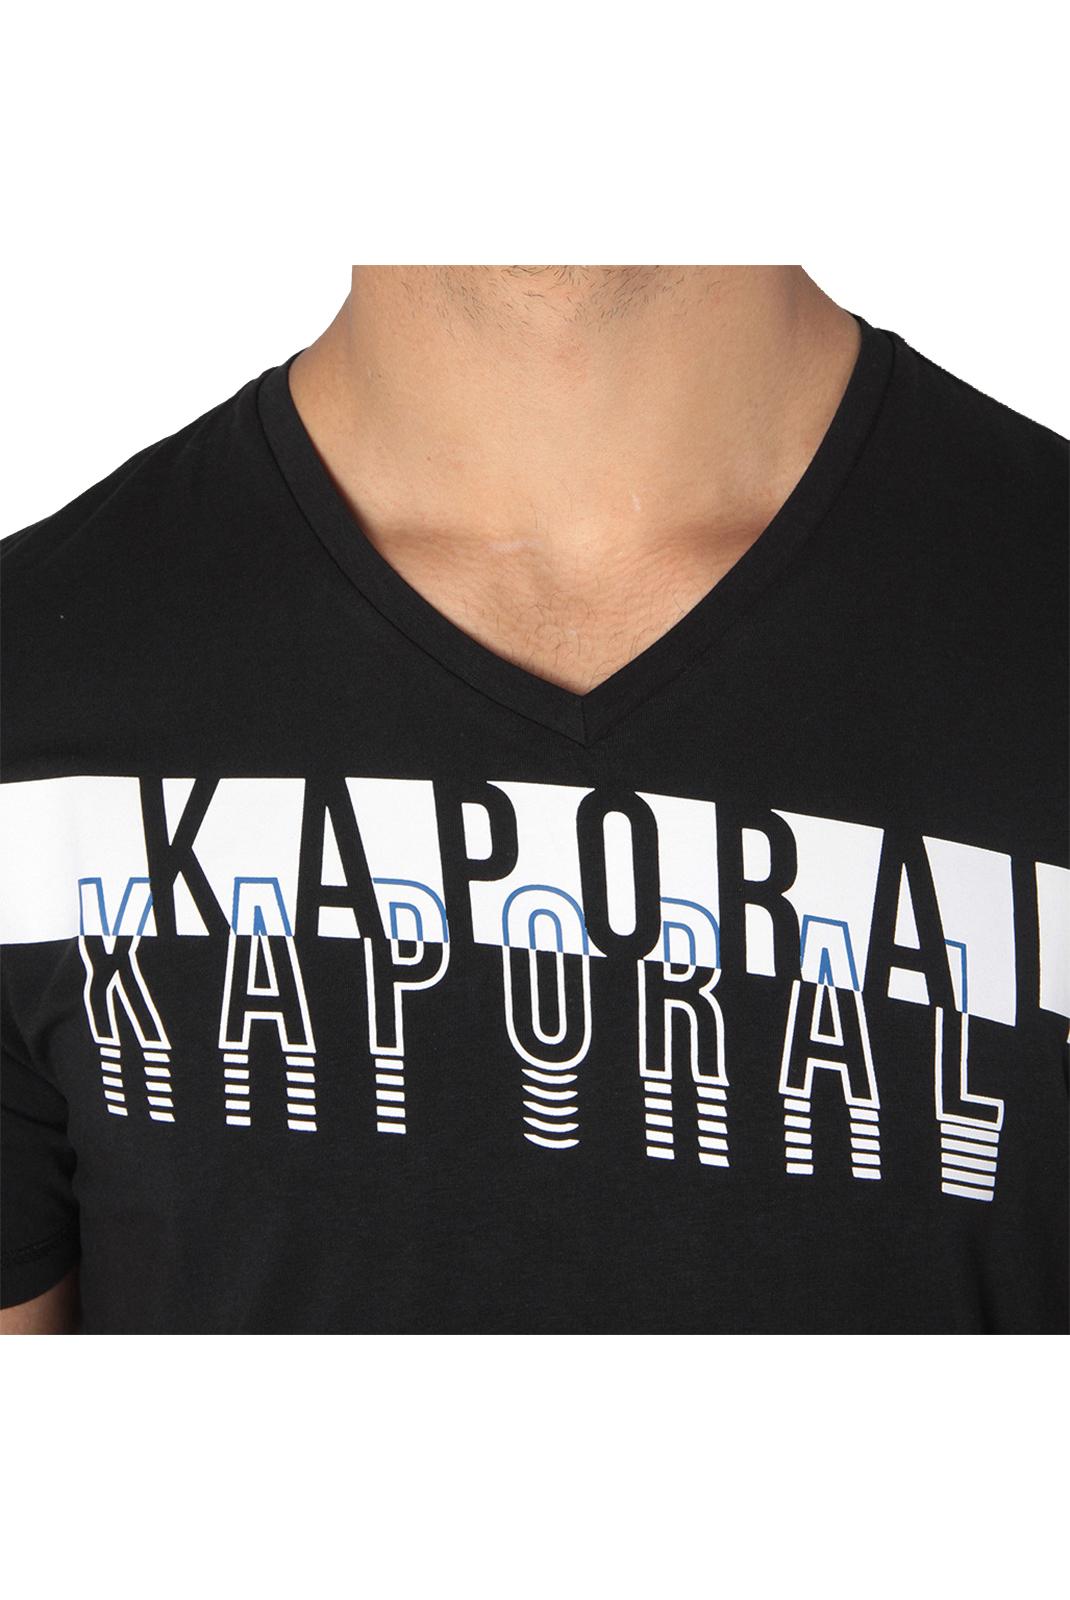 T-S manches courtes  Kaporal MOLCO BLACK